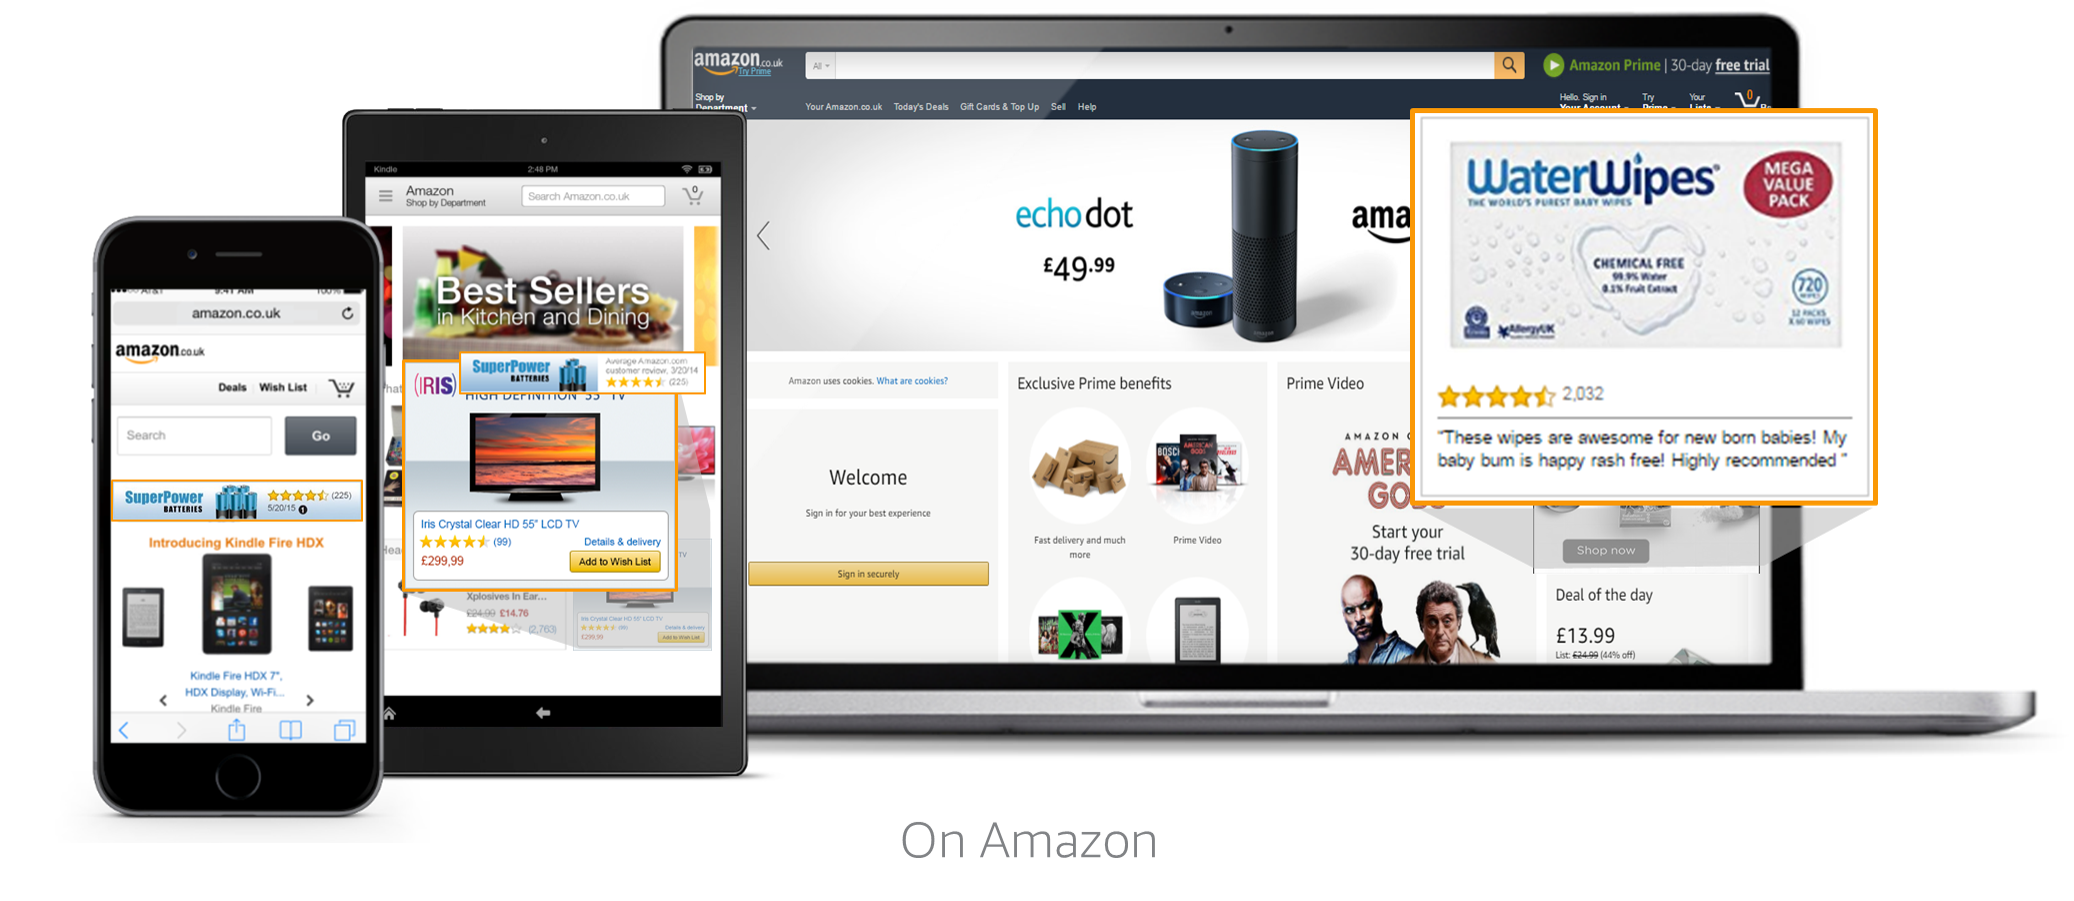 On [Amazon.com](https://www.amazon.com/?ref_=A20M-displayads)